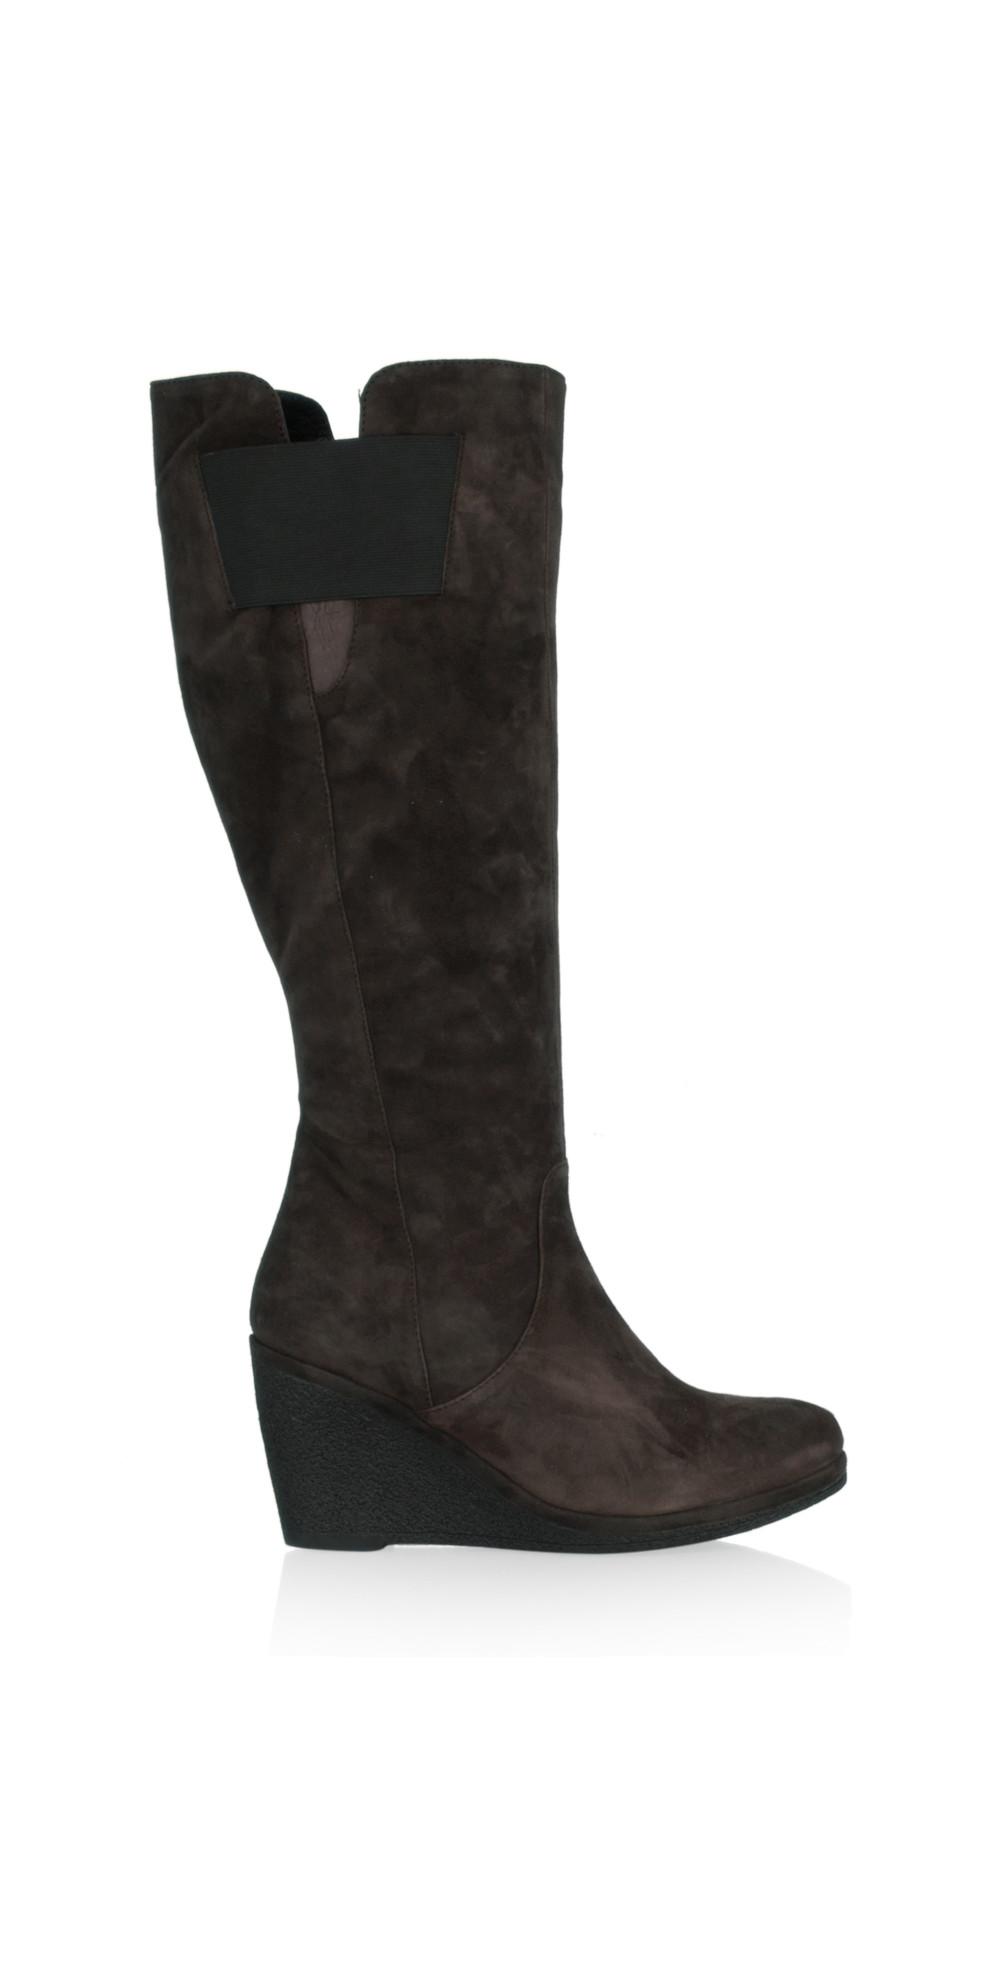 vanilla moon shoes luz wedge boot in dkbrown suede